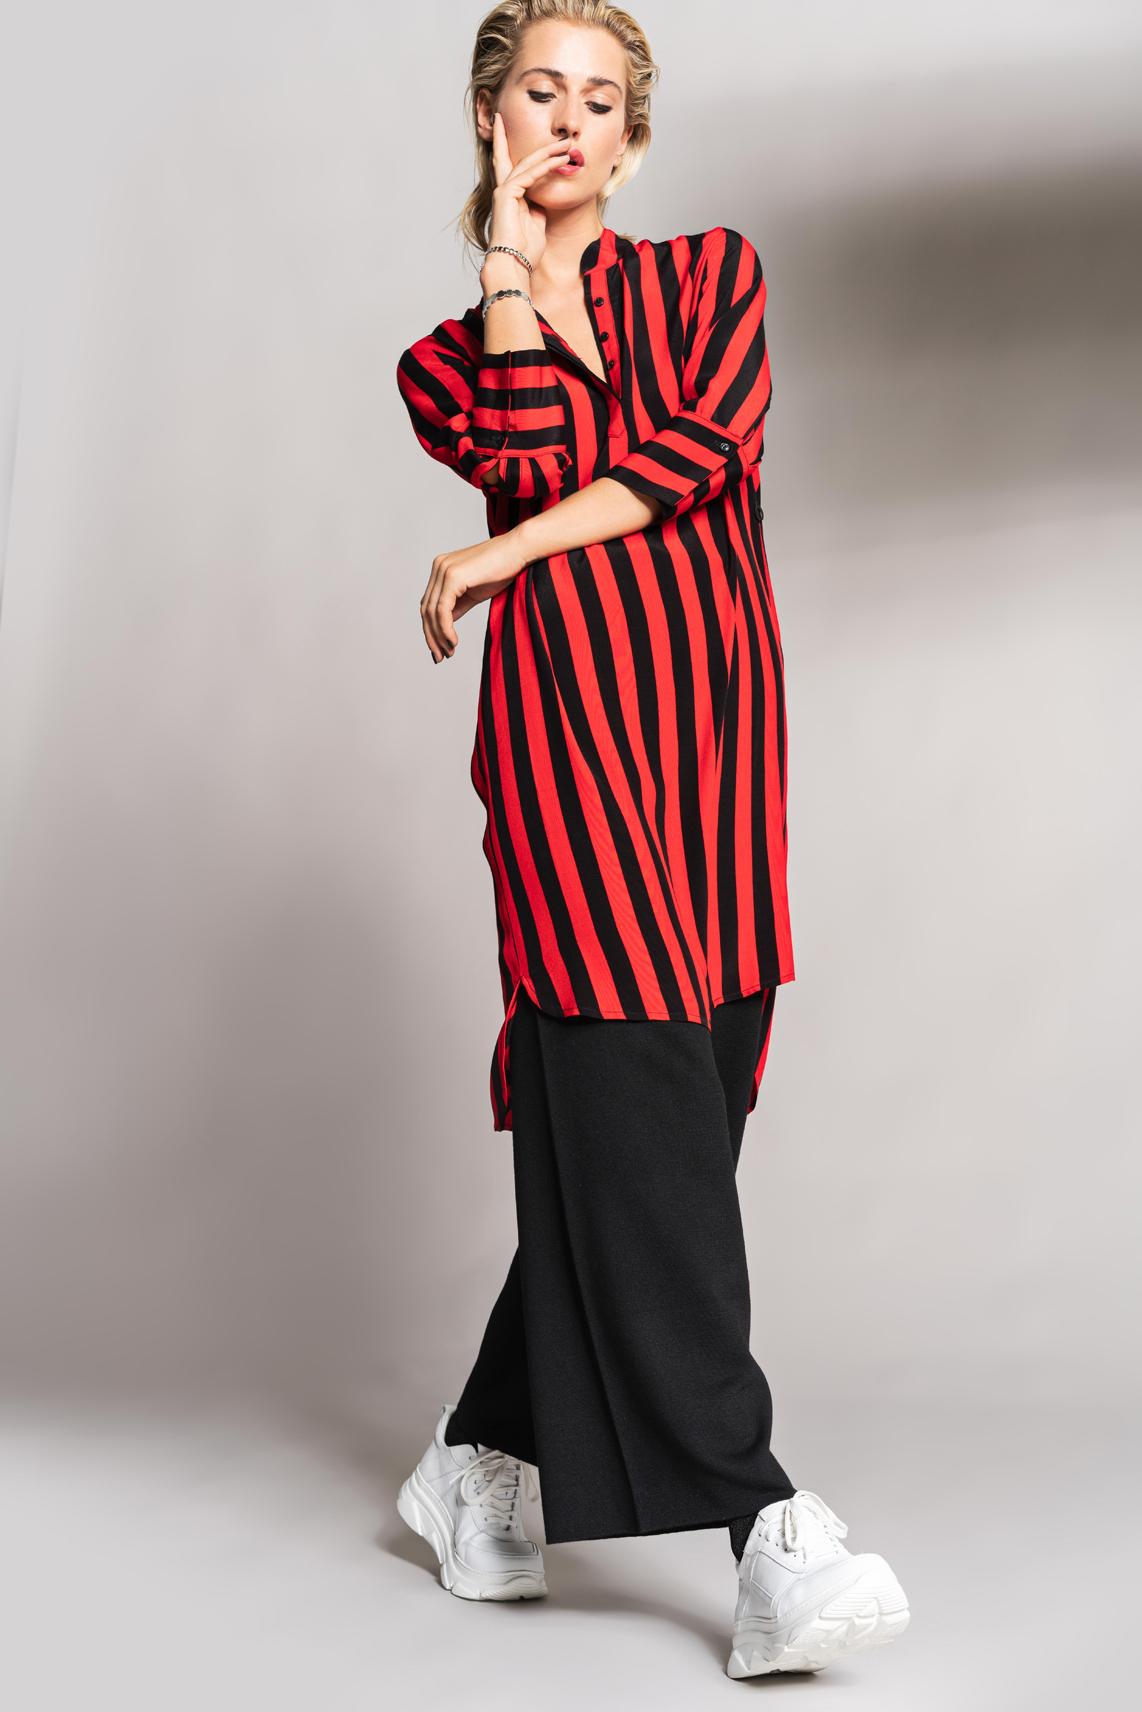 Anna Dames Gestreepte jurk Rood